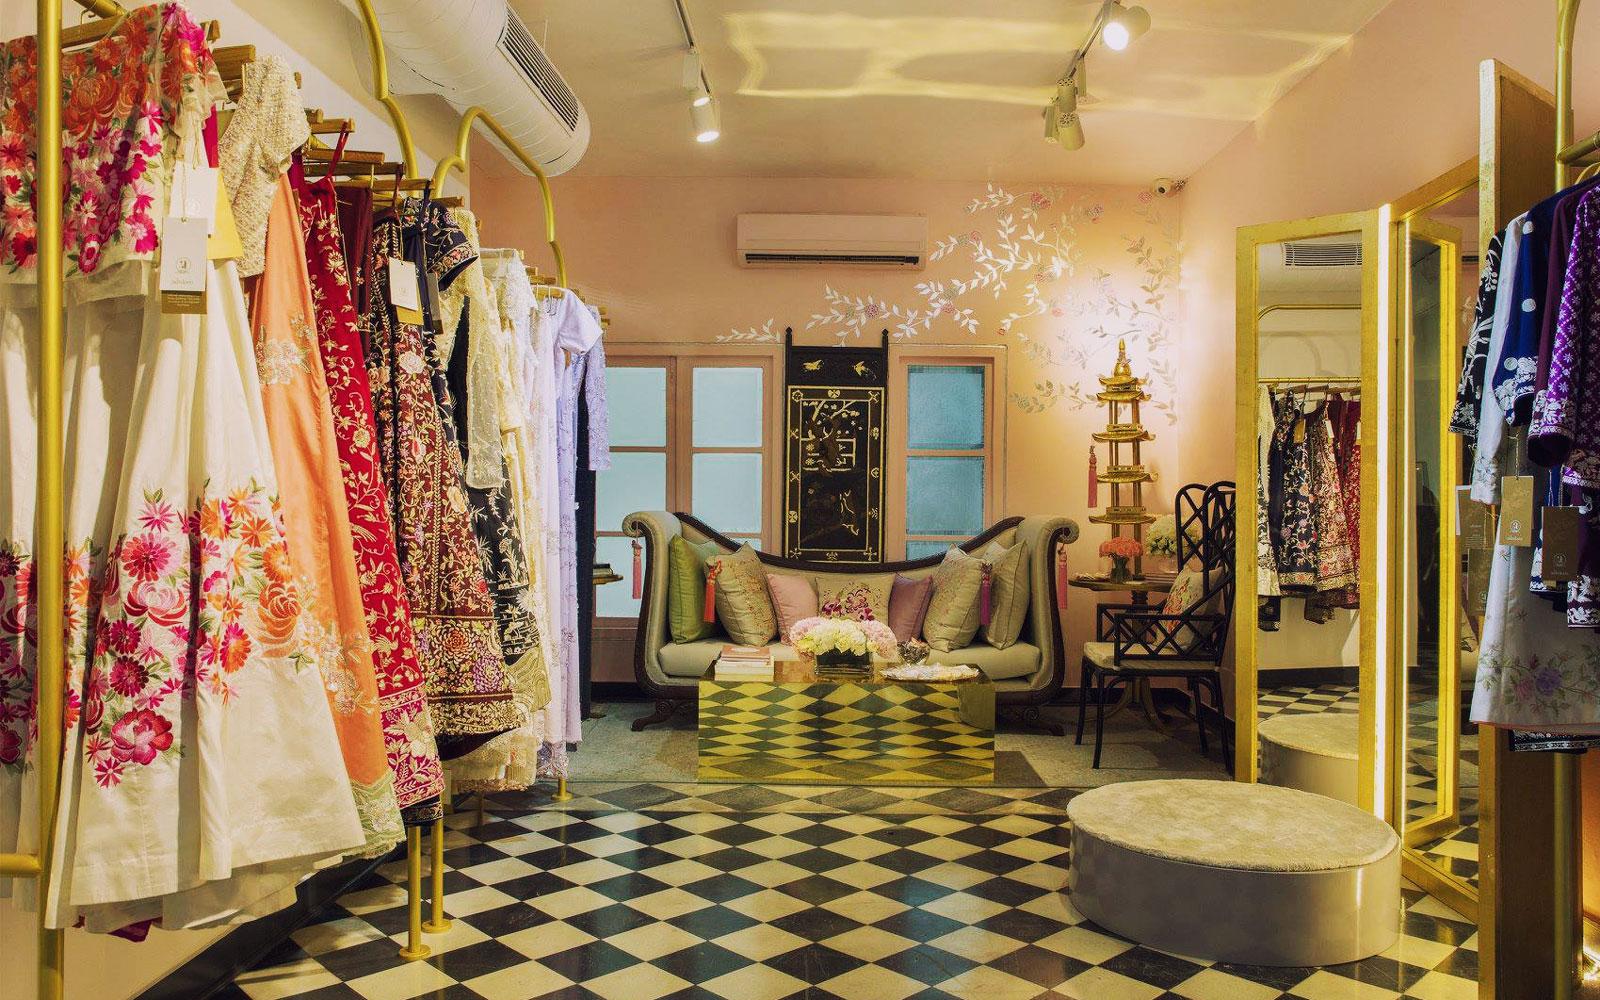 Tea, Parsi hospitality and Zoroastrian embroidery work at Ashdeen Lilaowala's design studio.